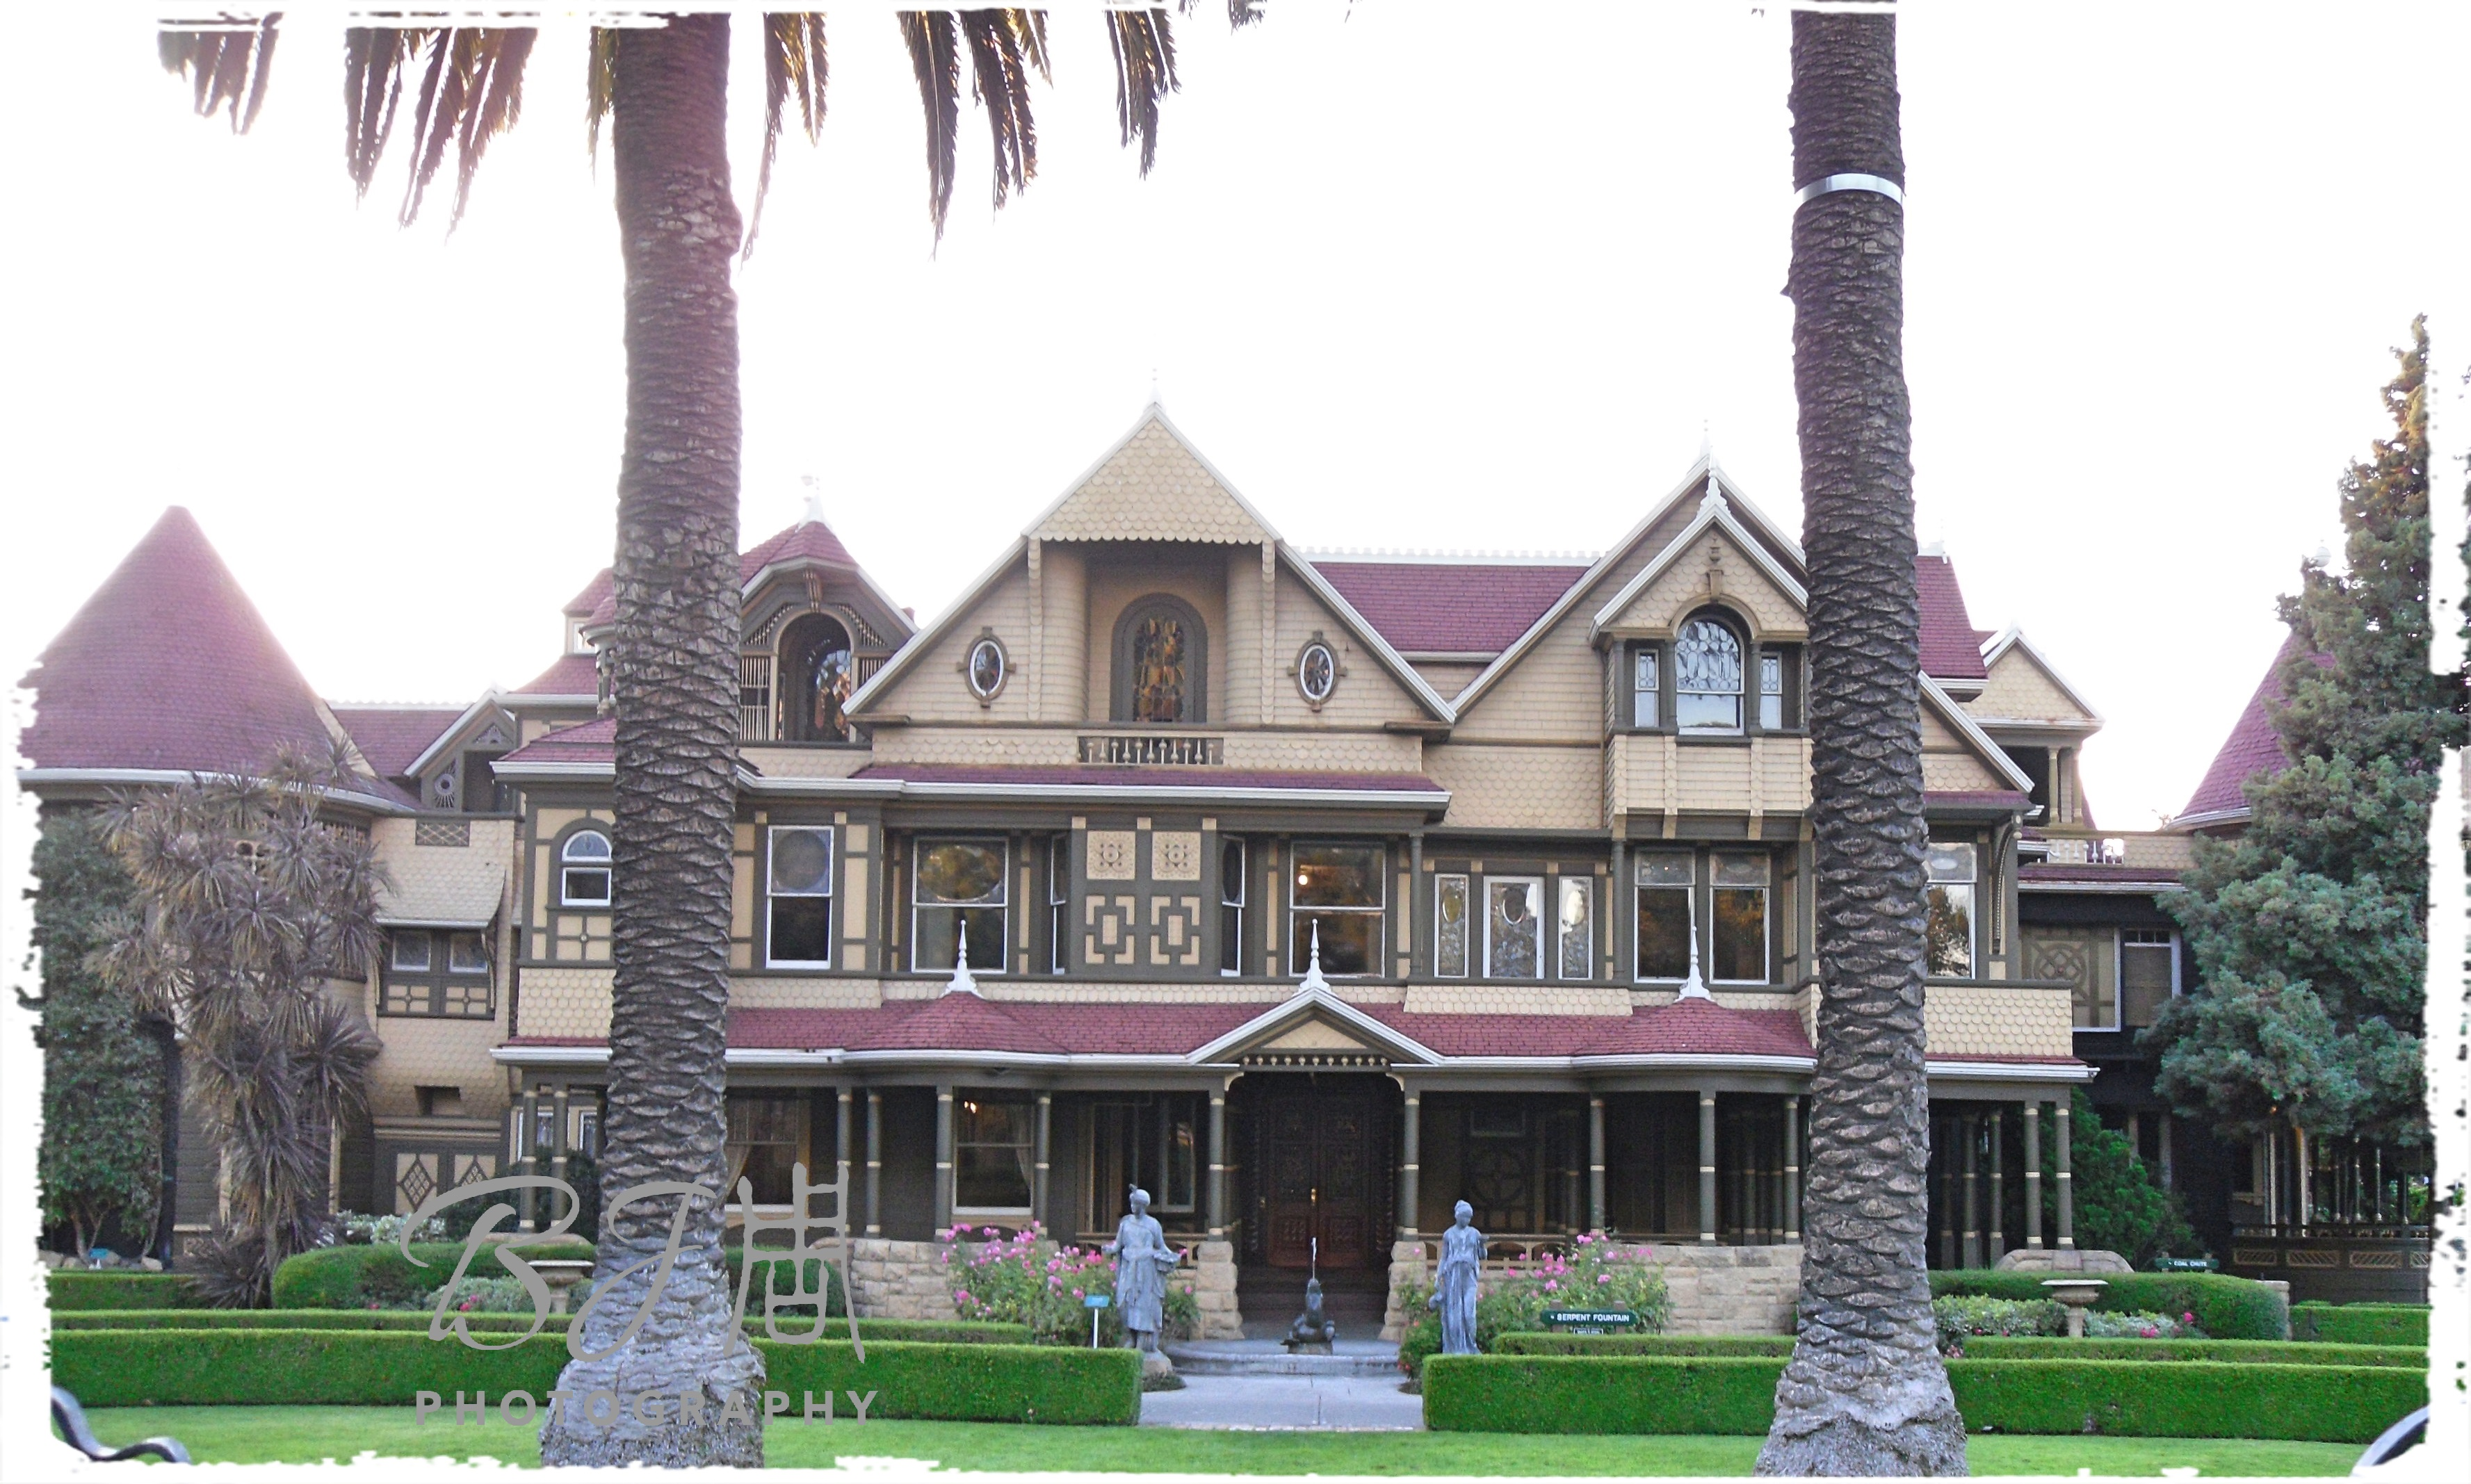 Permalink to:政府認證的鬼屋 – 加州溫切斯特神秘屋